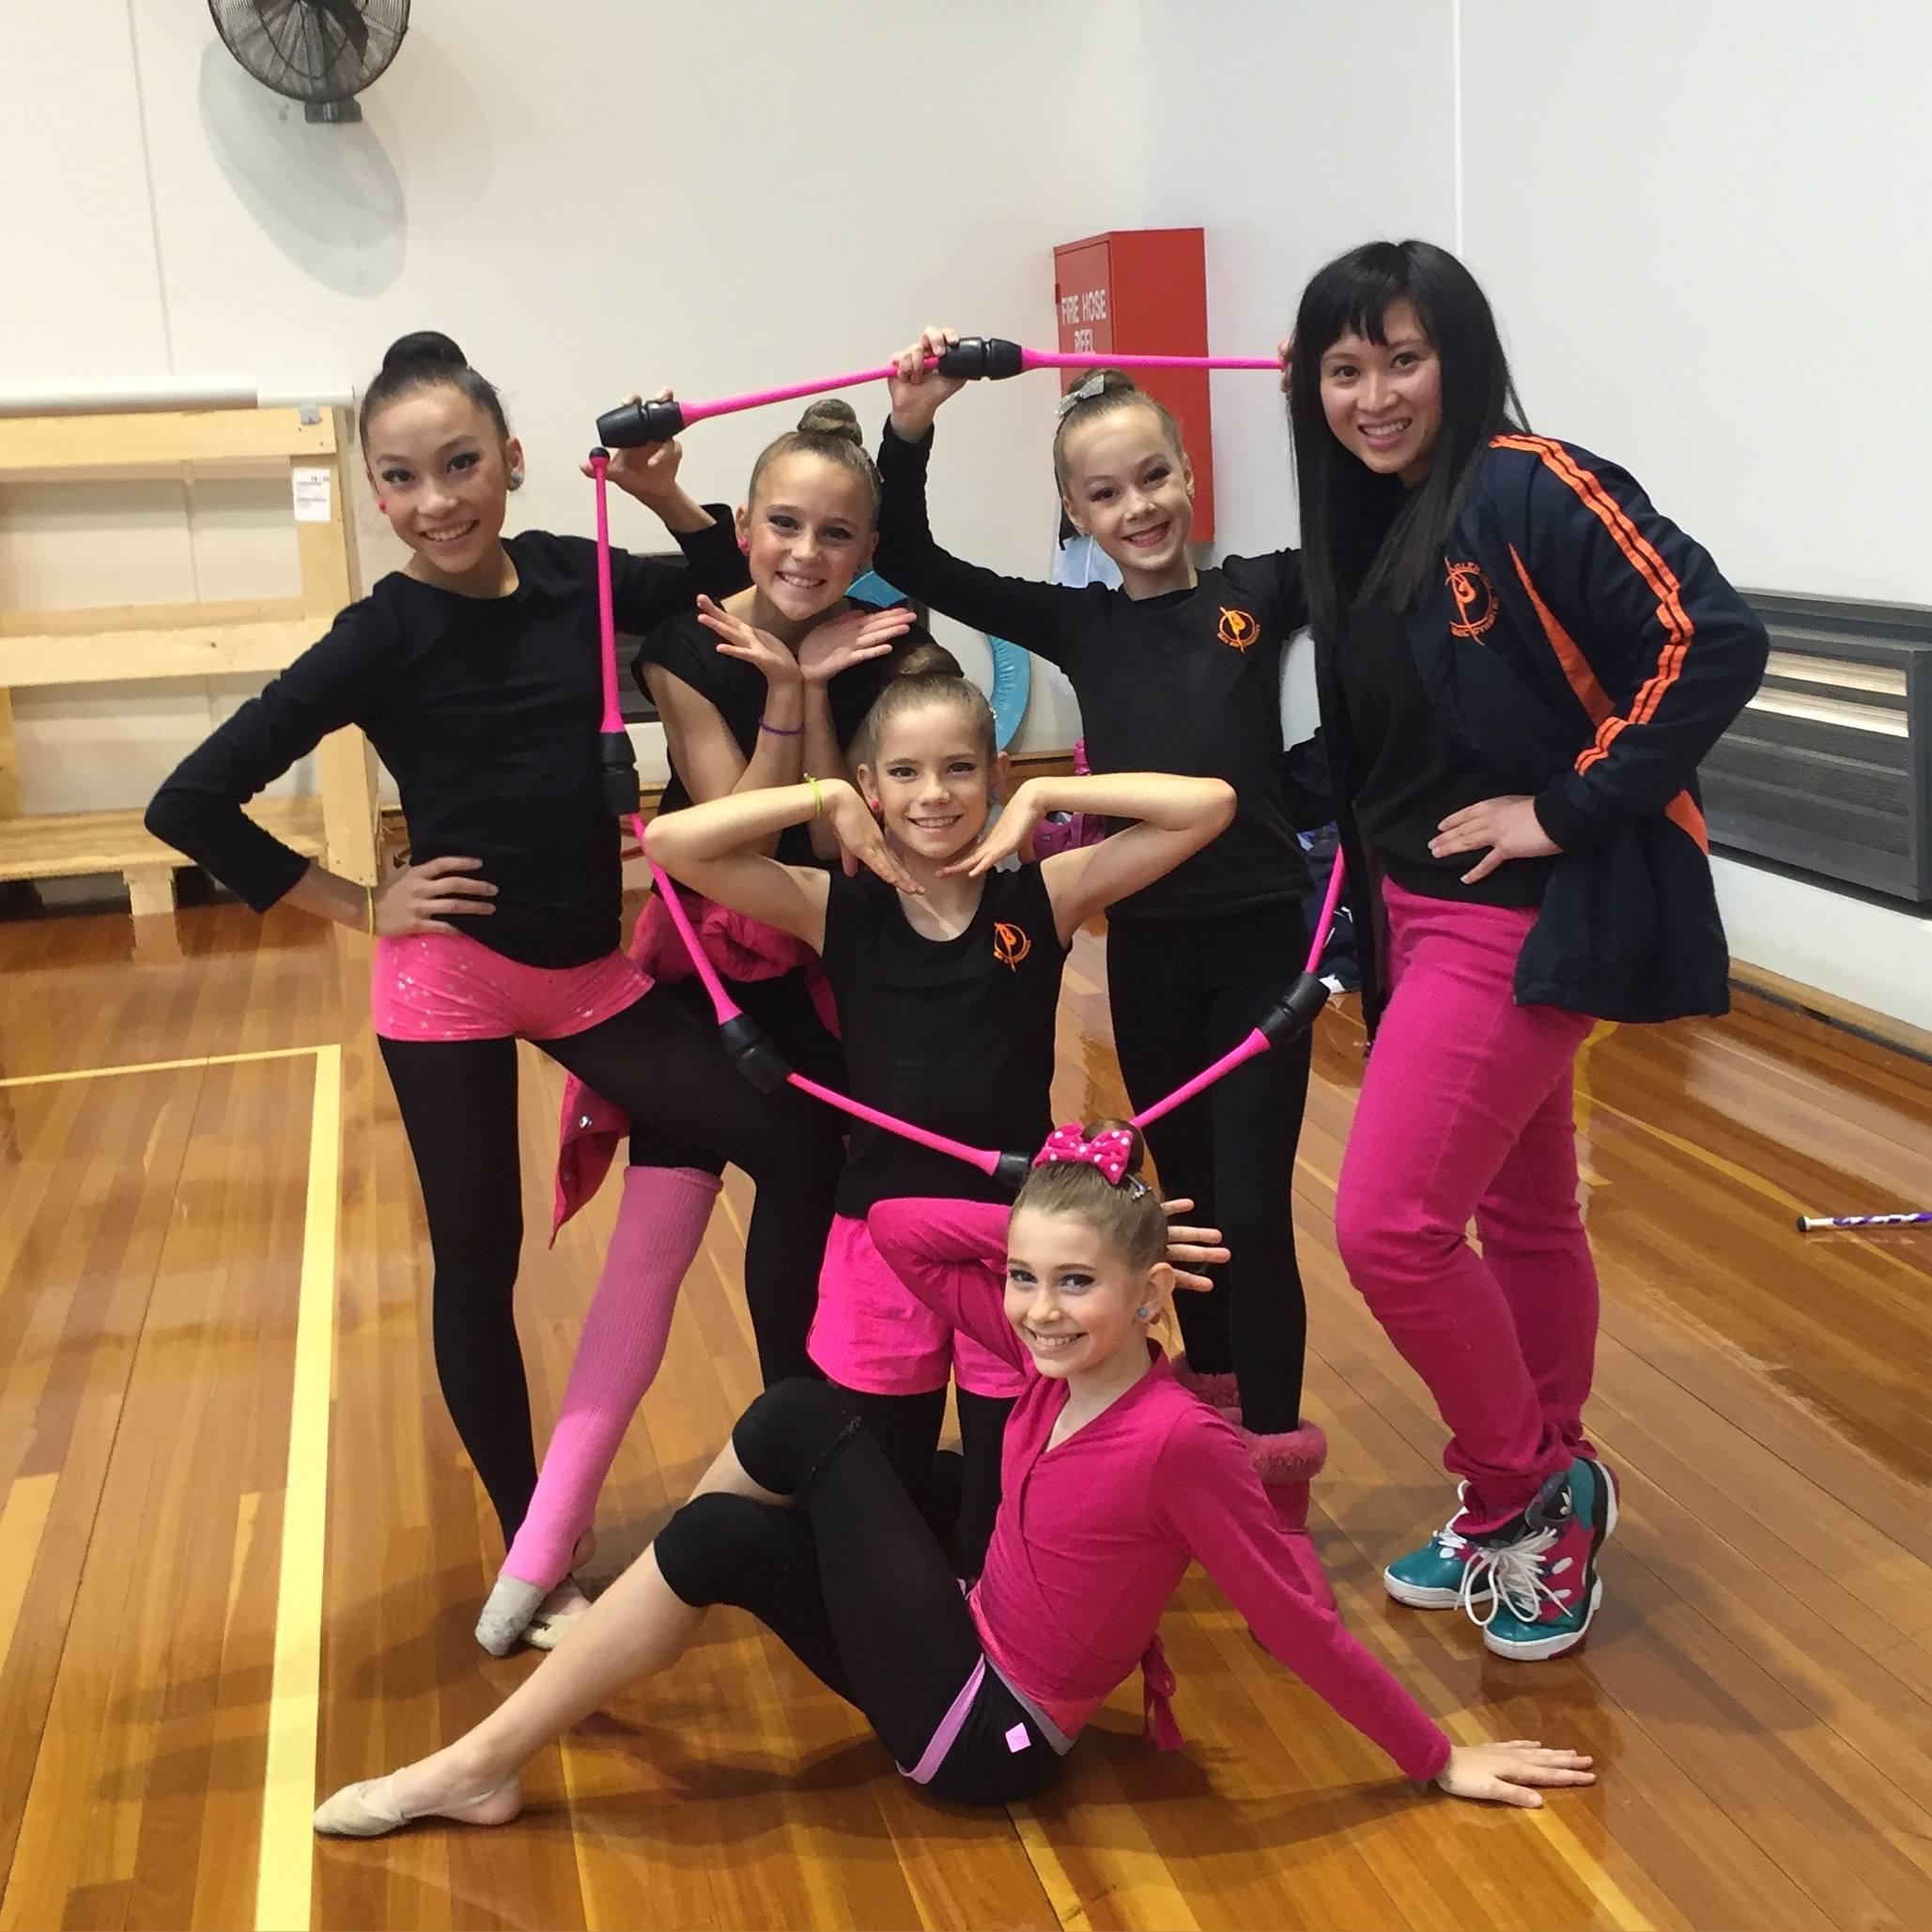 Glen Iris Rhythmic Gymnastics